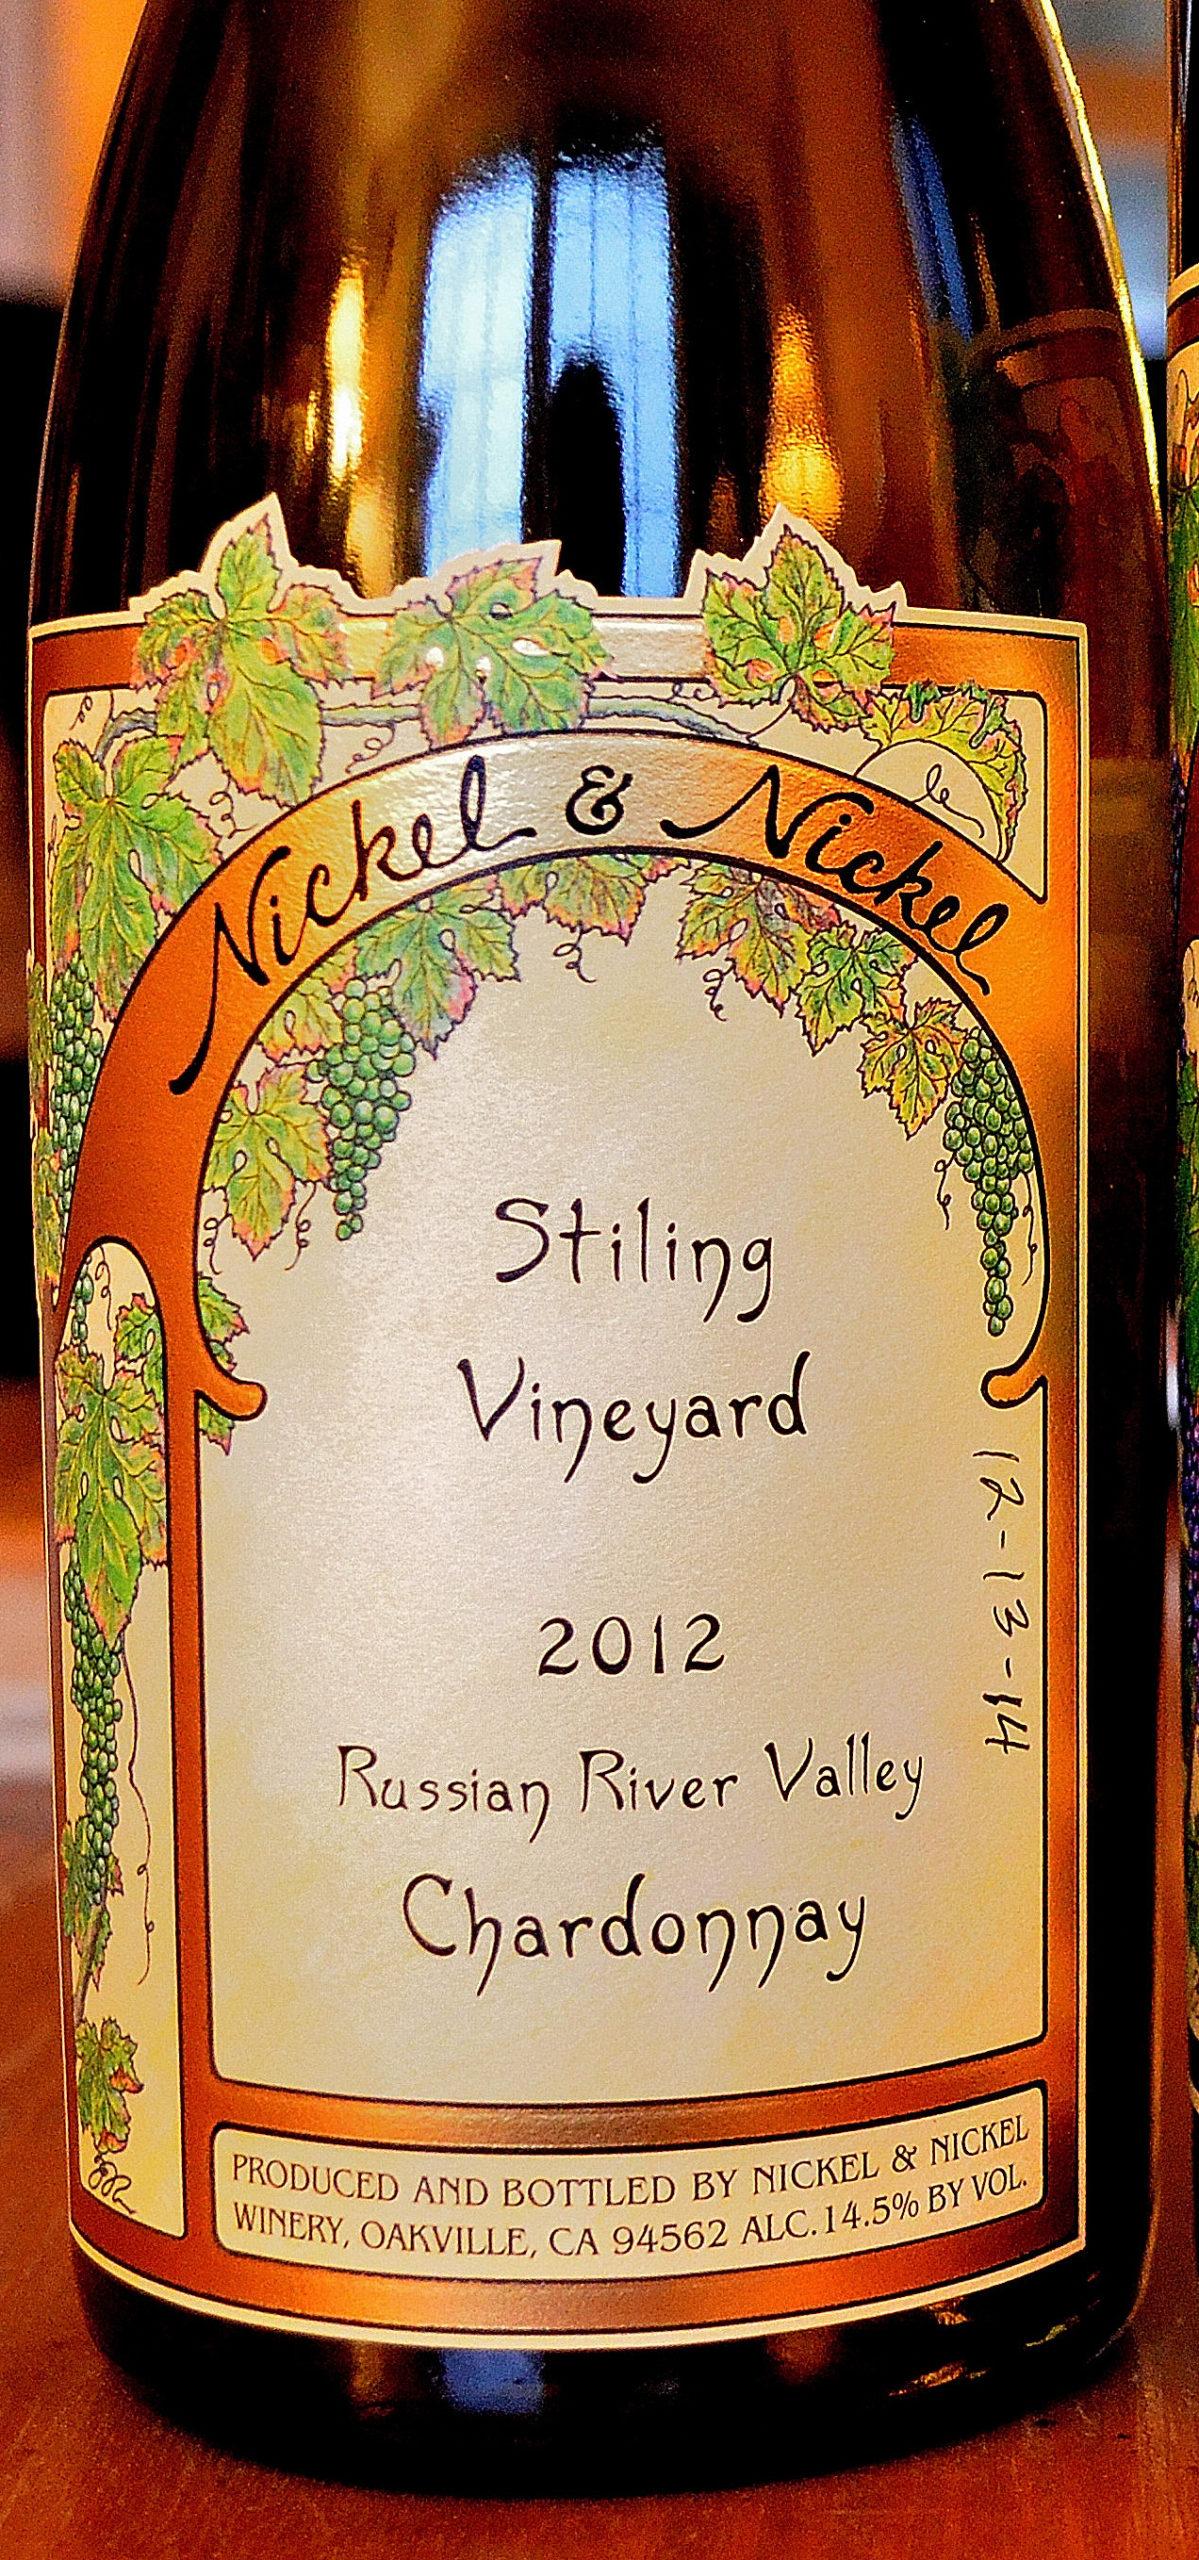 Nickel Nickel Stiling Vineyard 2012 RRV Chardonnay